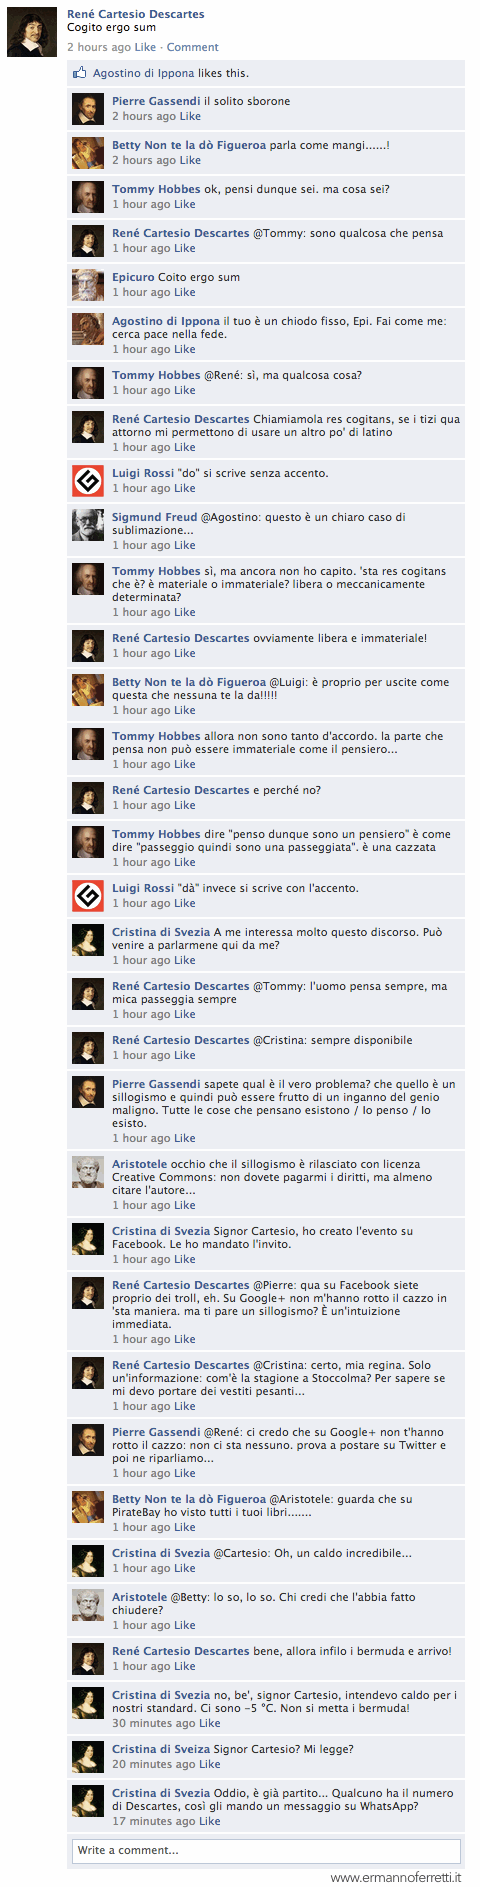 Cartesio annuncia il suo cogito ergo sum su Facebook